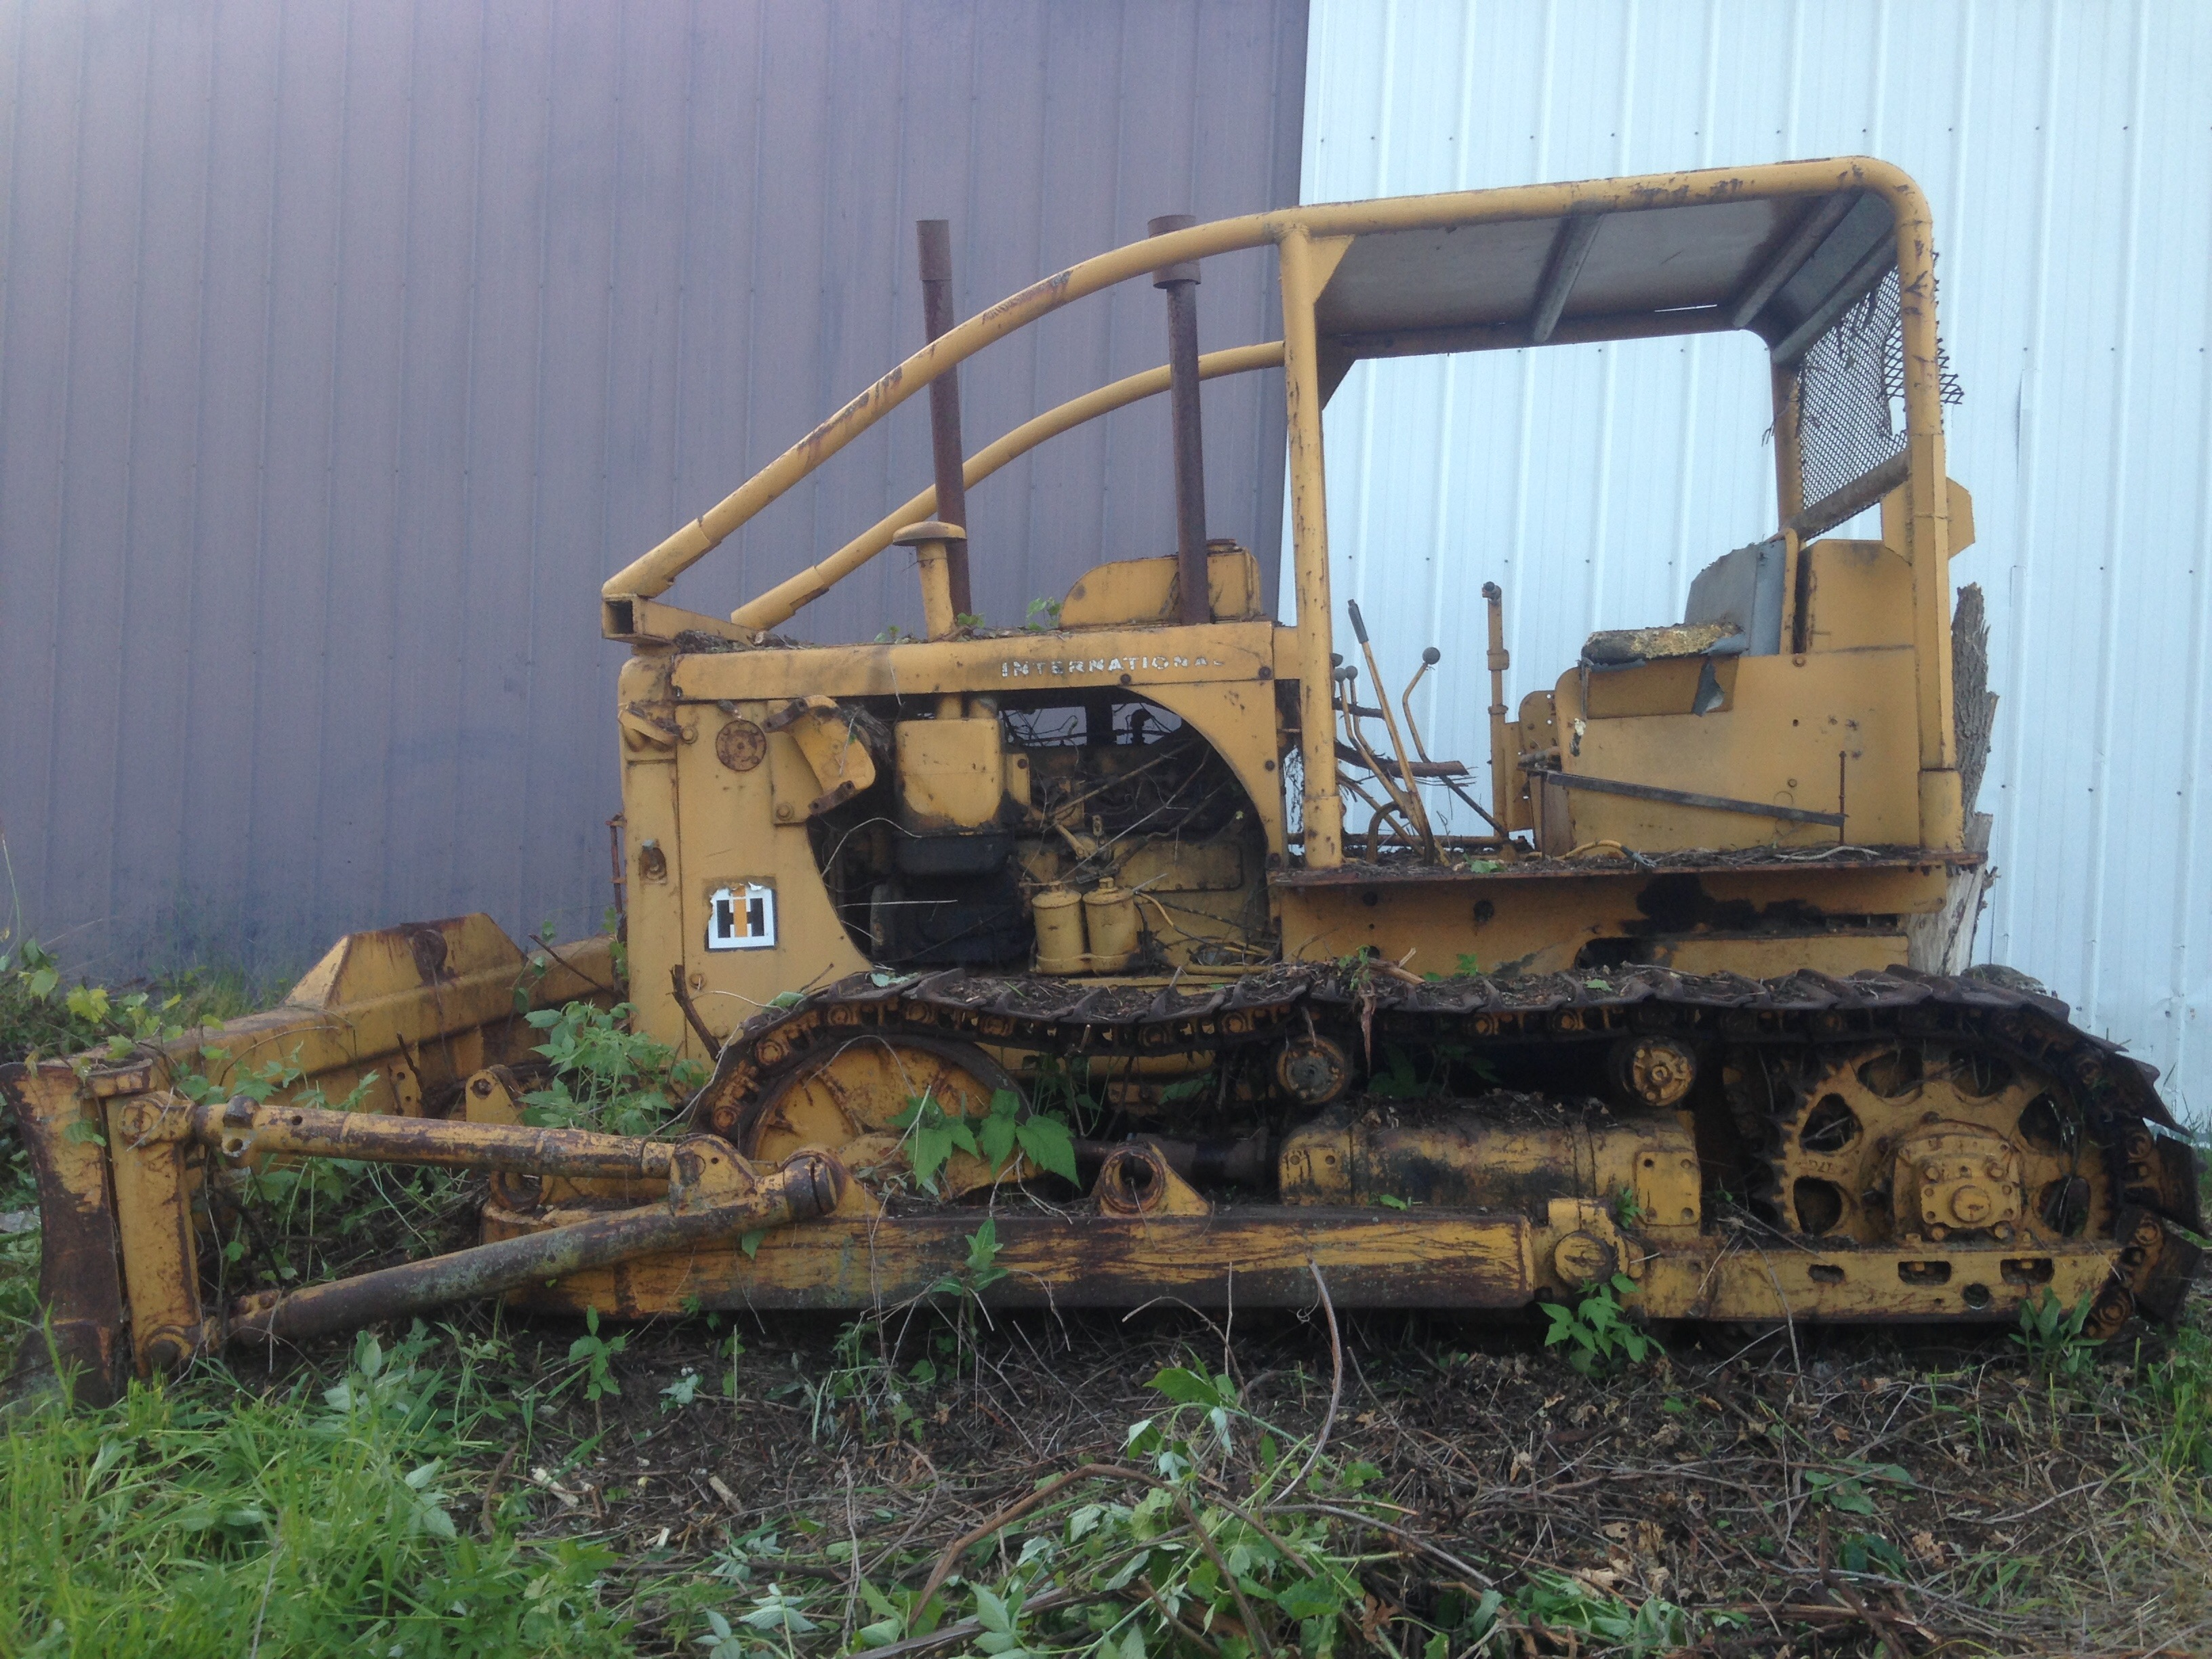 TD-15 dozer for sale for restore or parts - IH Construction